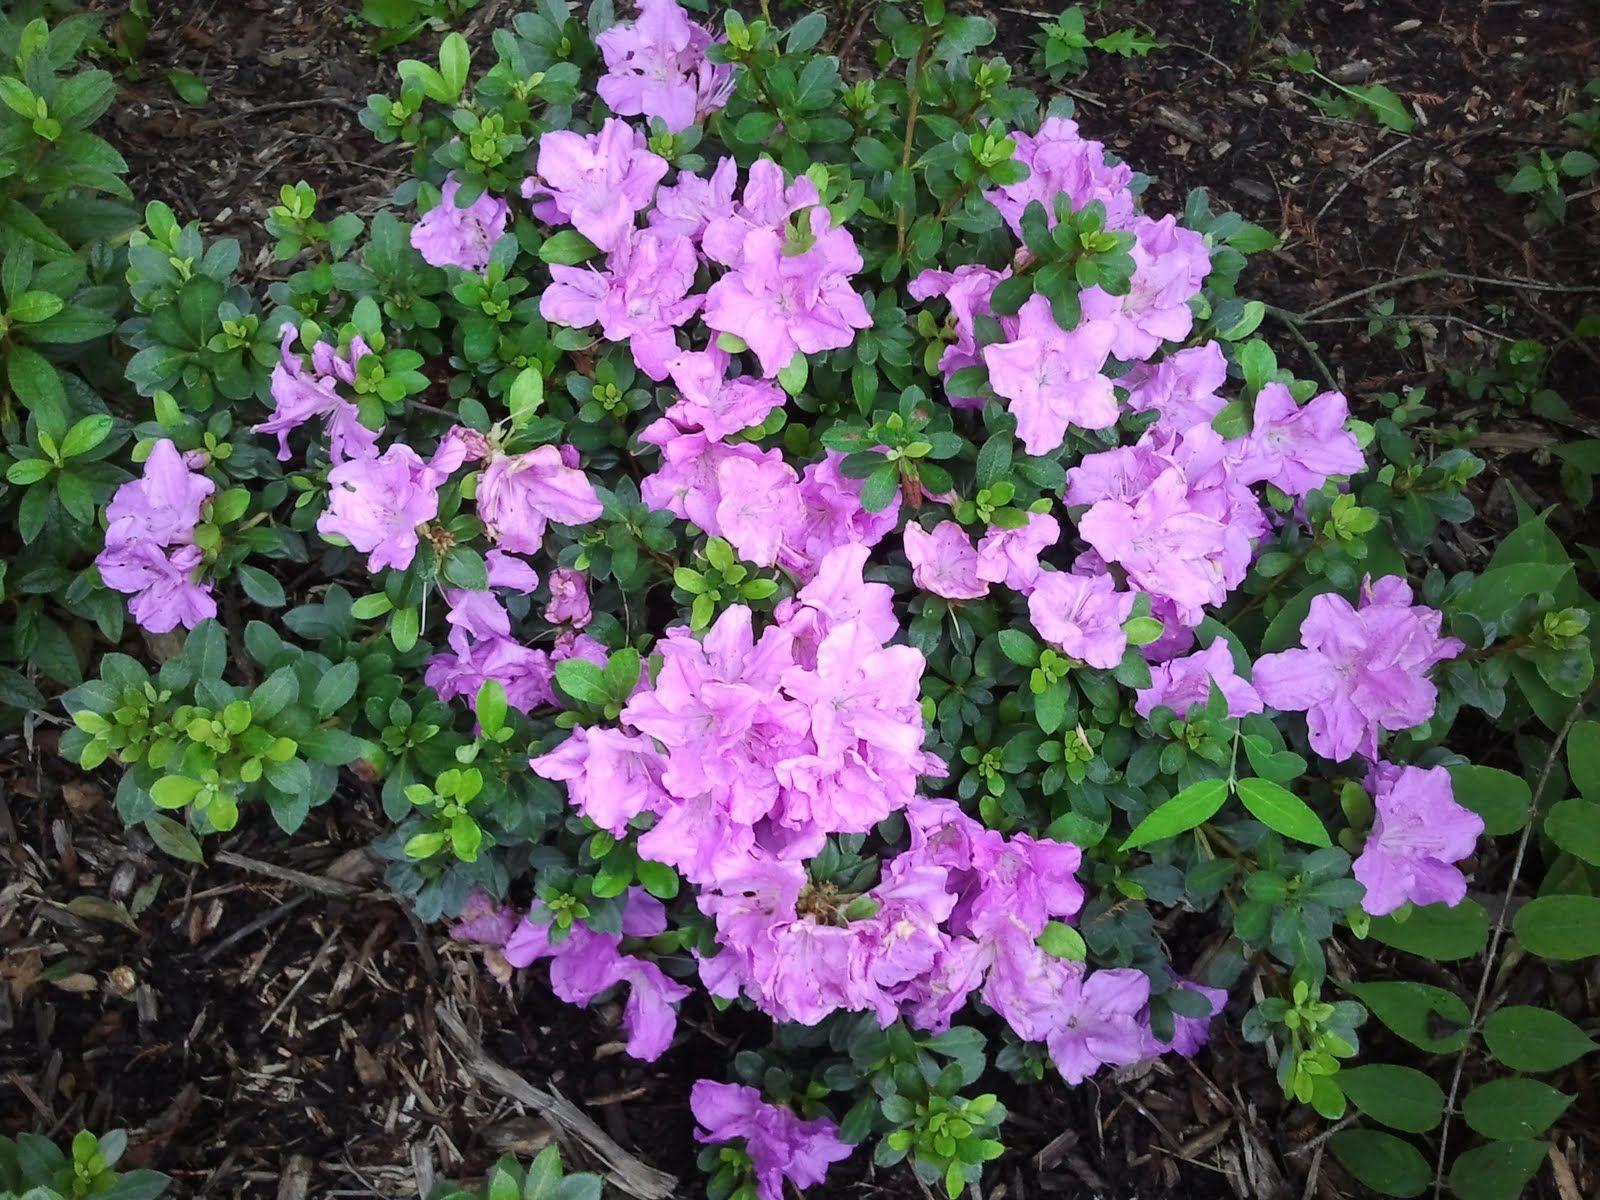 Encore Azalea Autumn Lilac An Evergreen Azalea That Blooms Both Spring And Fall 2 Flowers Are Lilac With Darker Fre Azalea Shrub Shrubs For Sale Azaleas